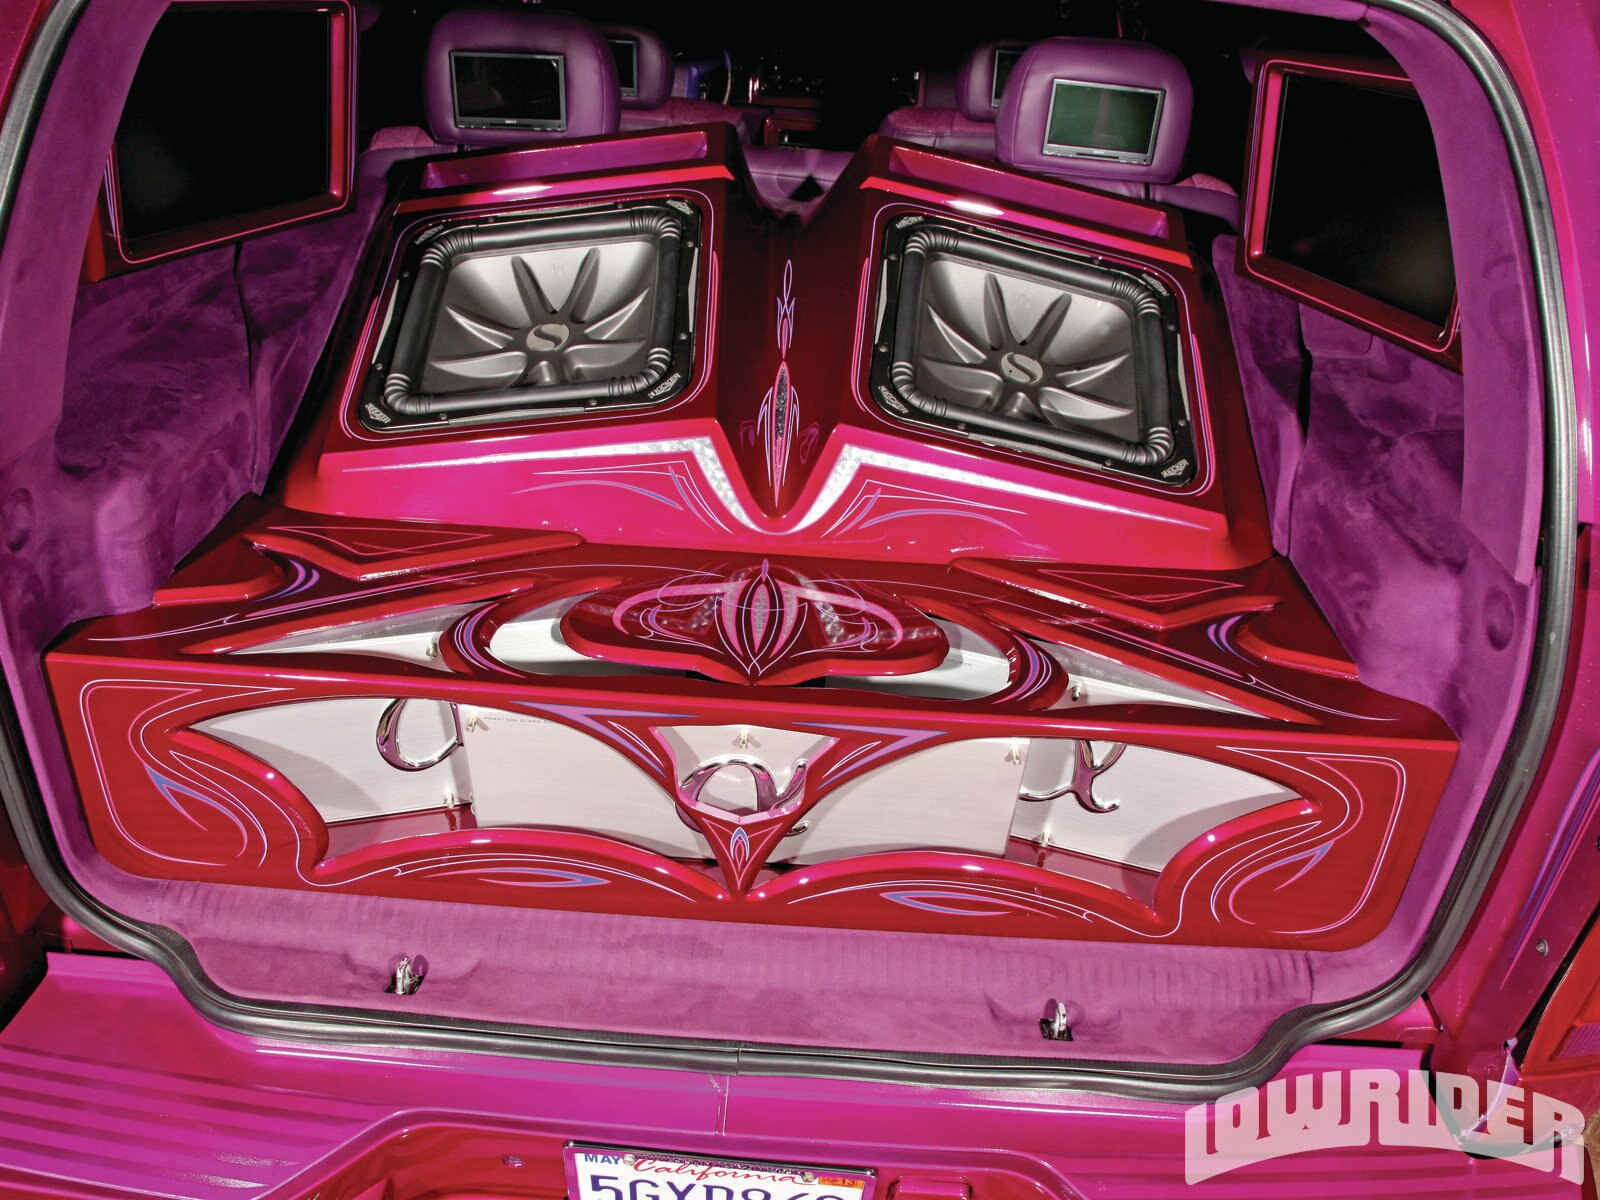 2002 Cadillac Escalade - Sweet Temptation - Lowrider Magazine